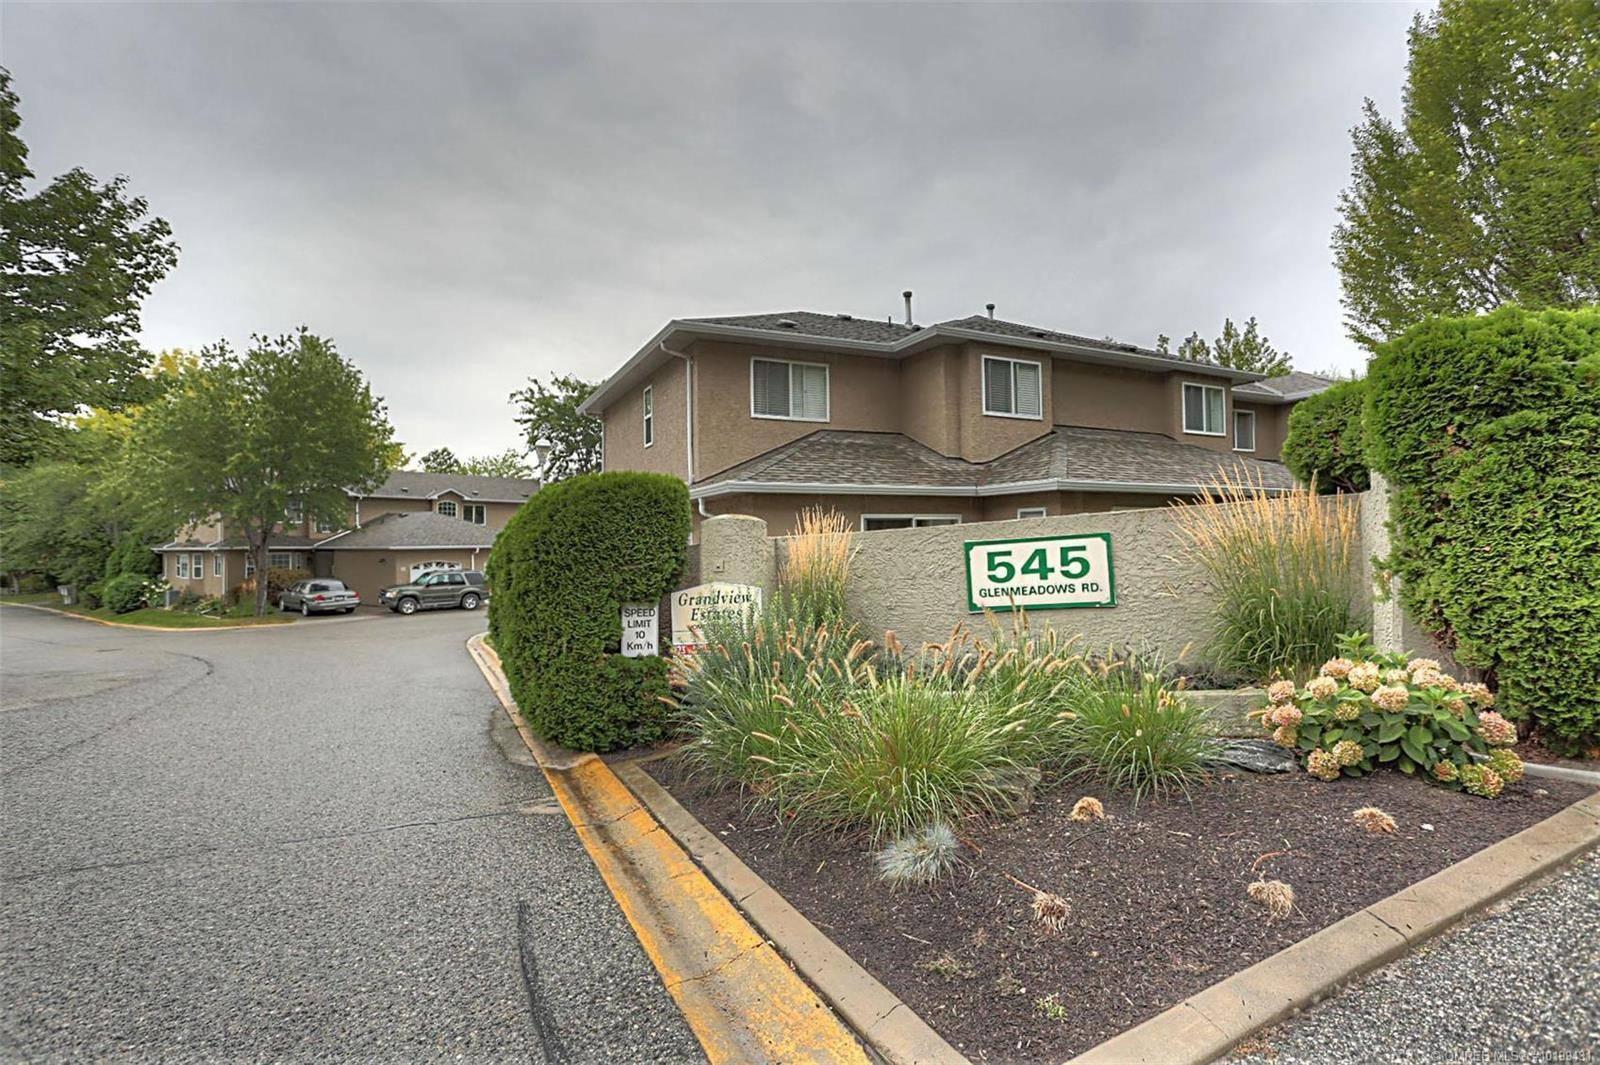 Townhouse for sale at 545 Glenmeadows Rd Unit 47 Kelowna British Columbia - MLS: 10199431